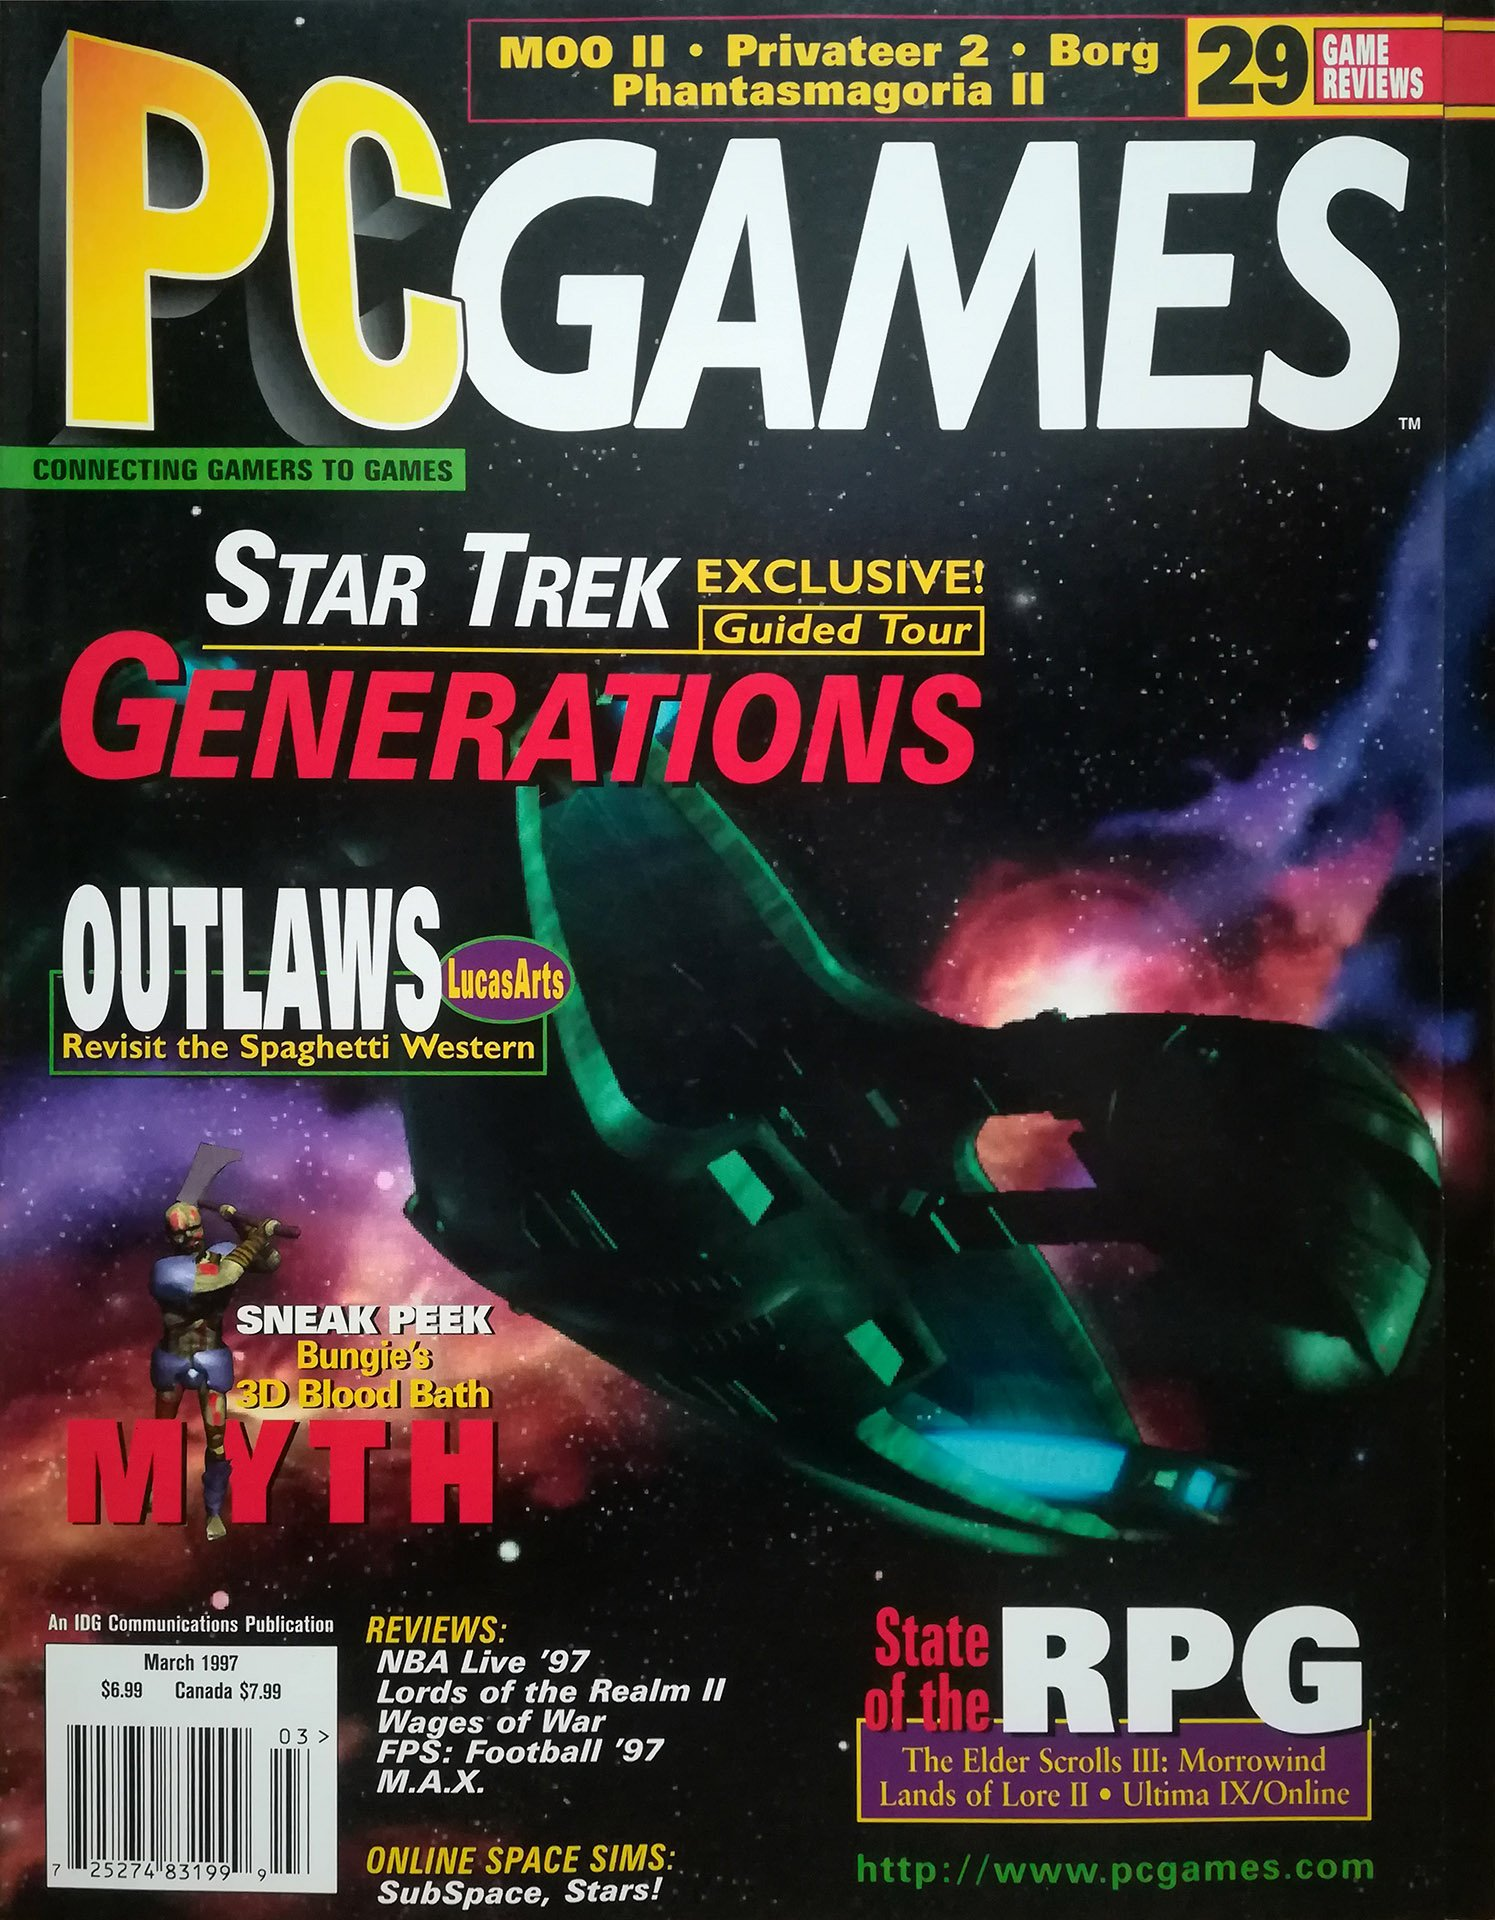 PC Games Vol. 04 No. 03 (March 1997)